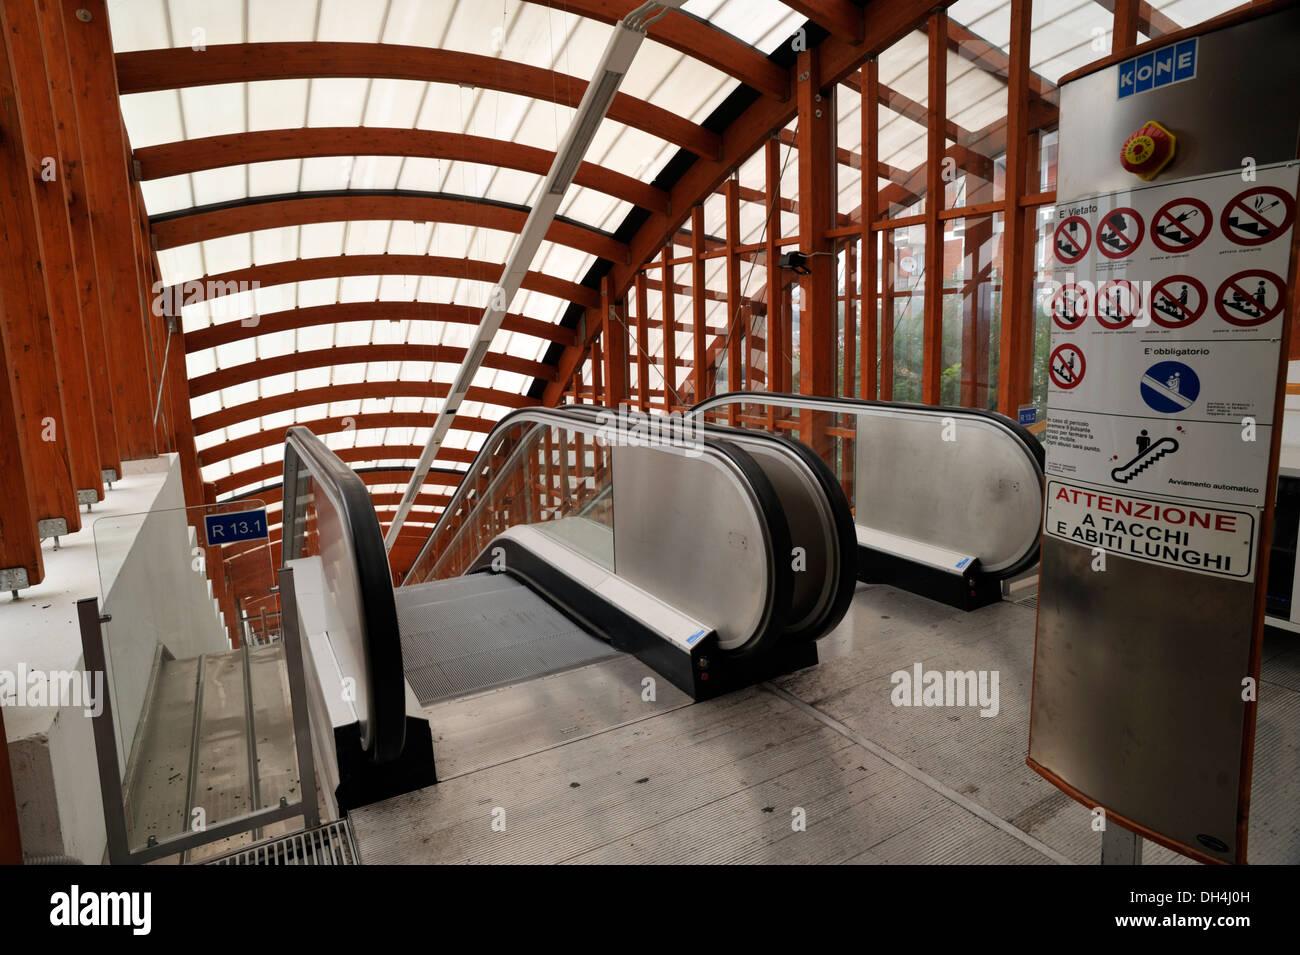 italy, basilicata, potenza, the new system of escalators and stock ... - Mobili E Mobili Potenza